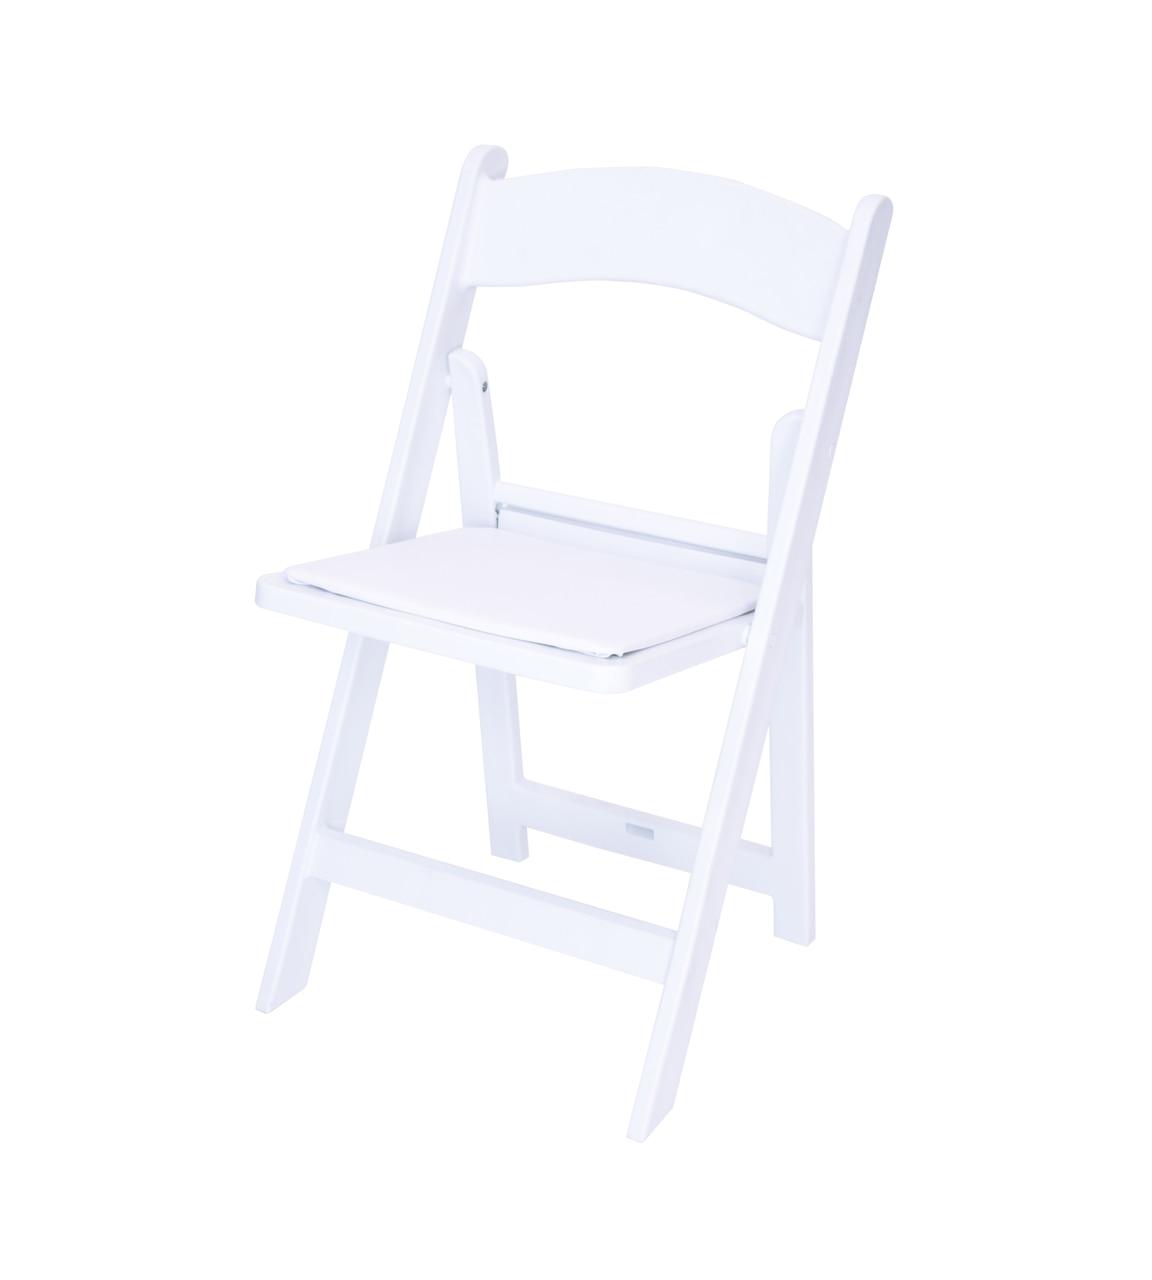 classic series white resin folding chair 1000 lb capacity wedding garden style